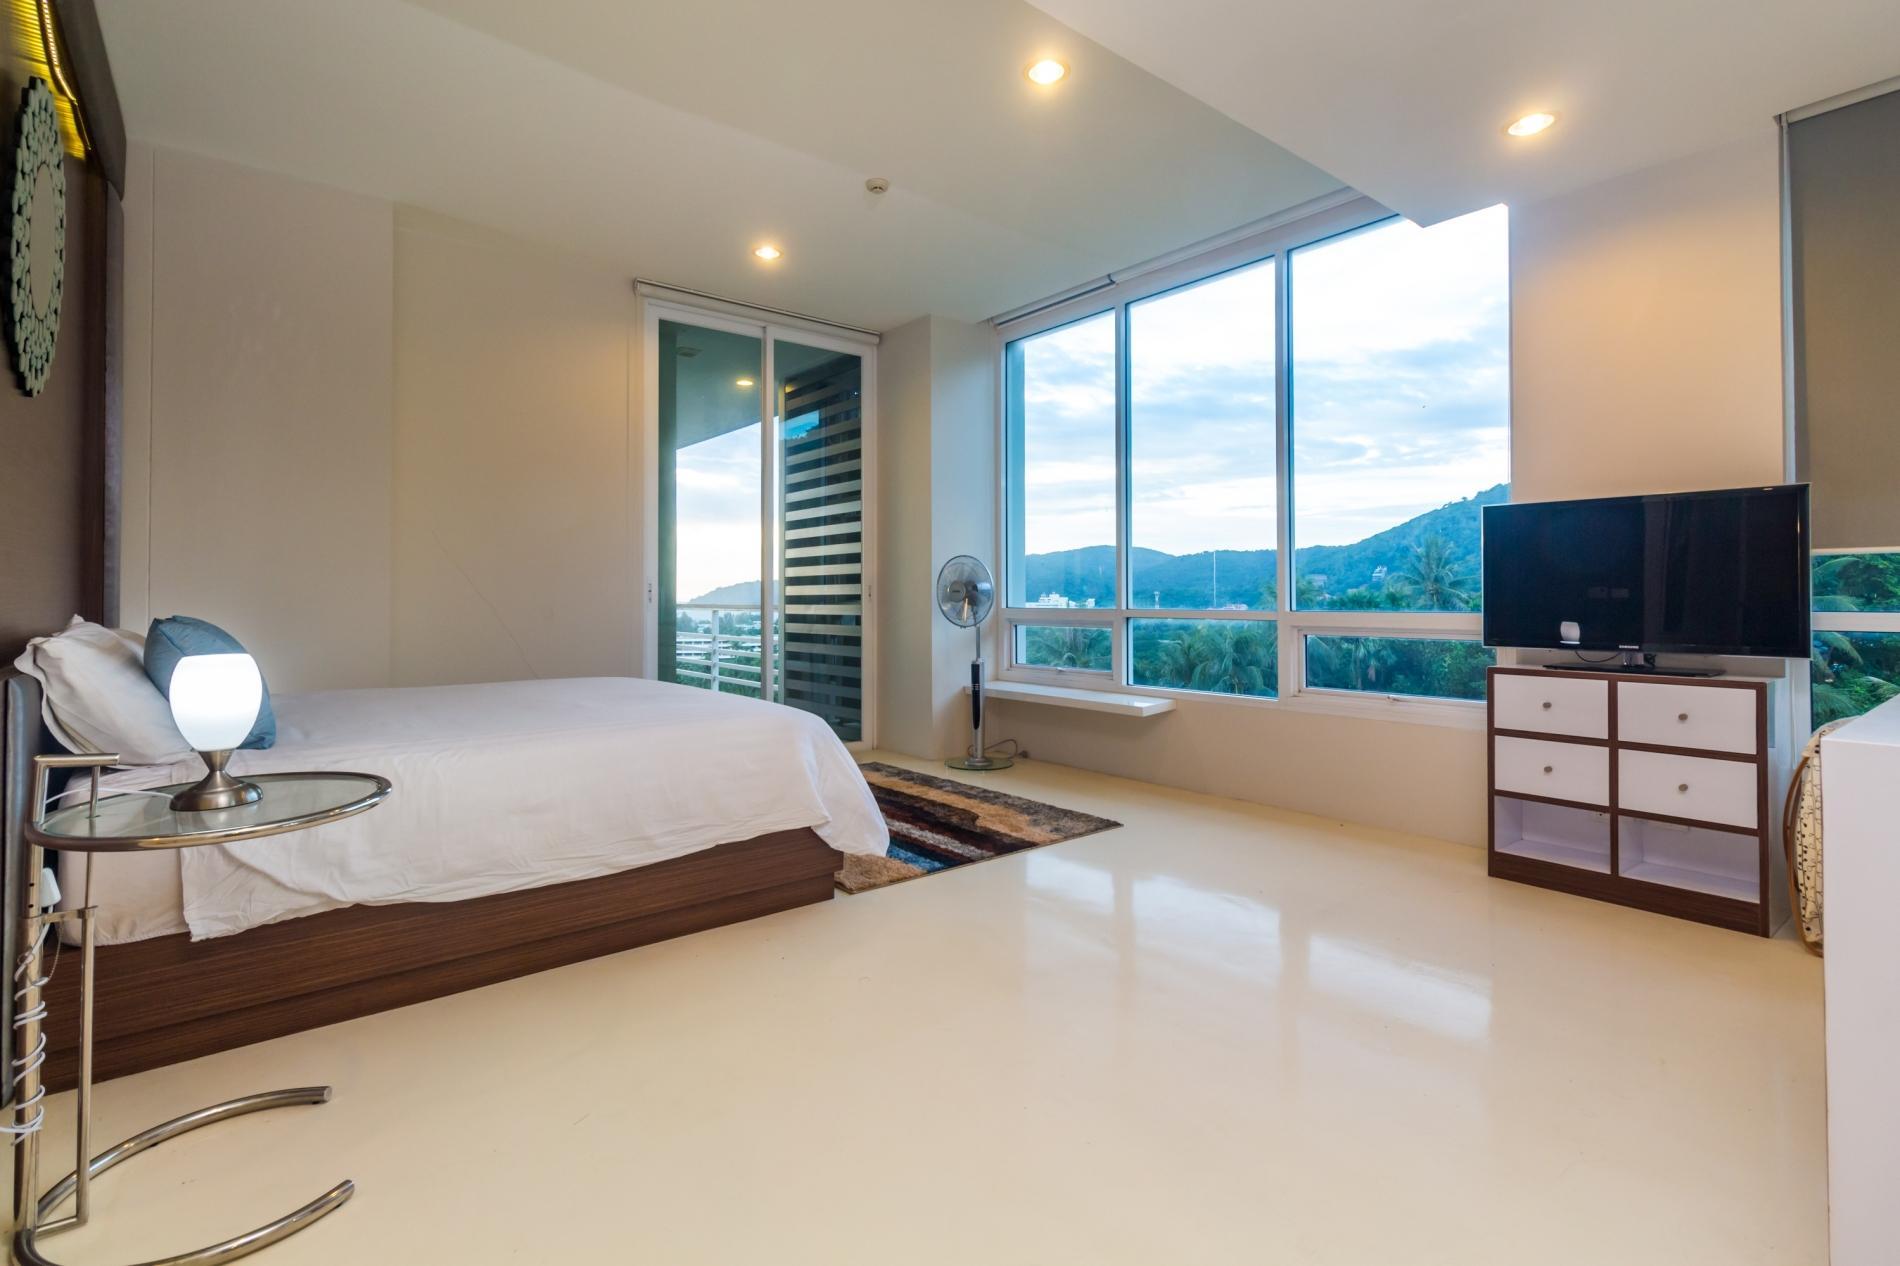 Apartment KH2605 - Sea-view Penthouse in Karon  walk to beach  restaurants  bars  shops photo 20390388